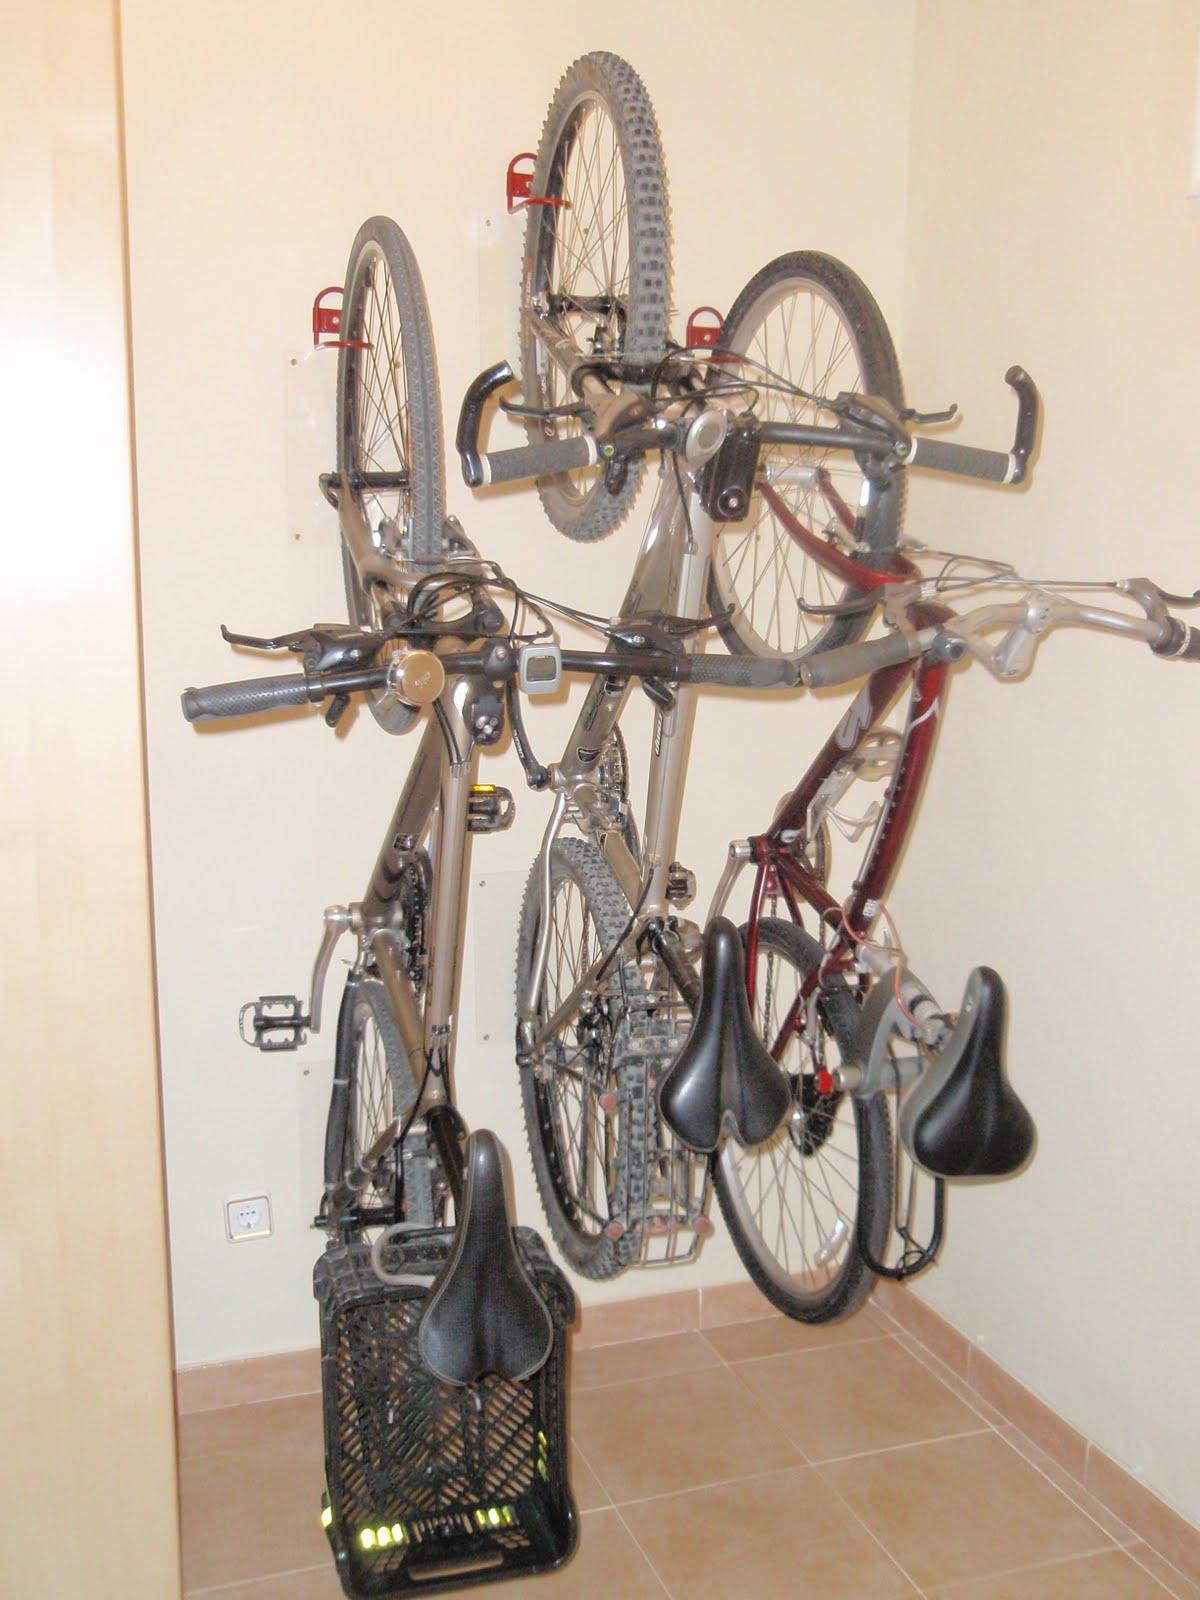 bici por barcelona tres bicis en 1 3 mentros de pared